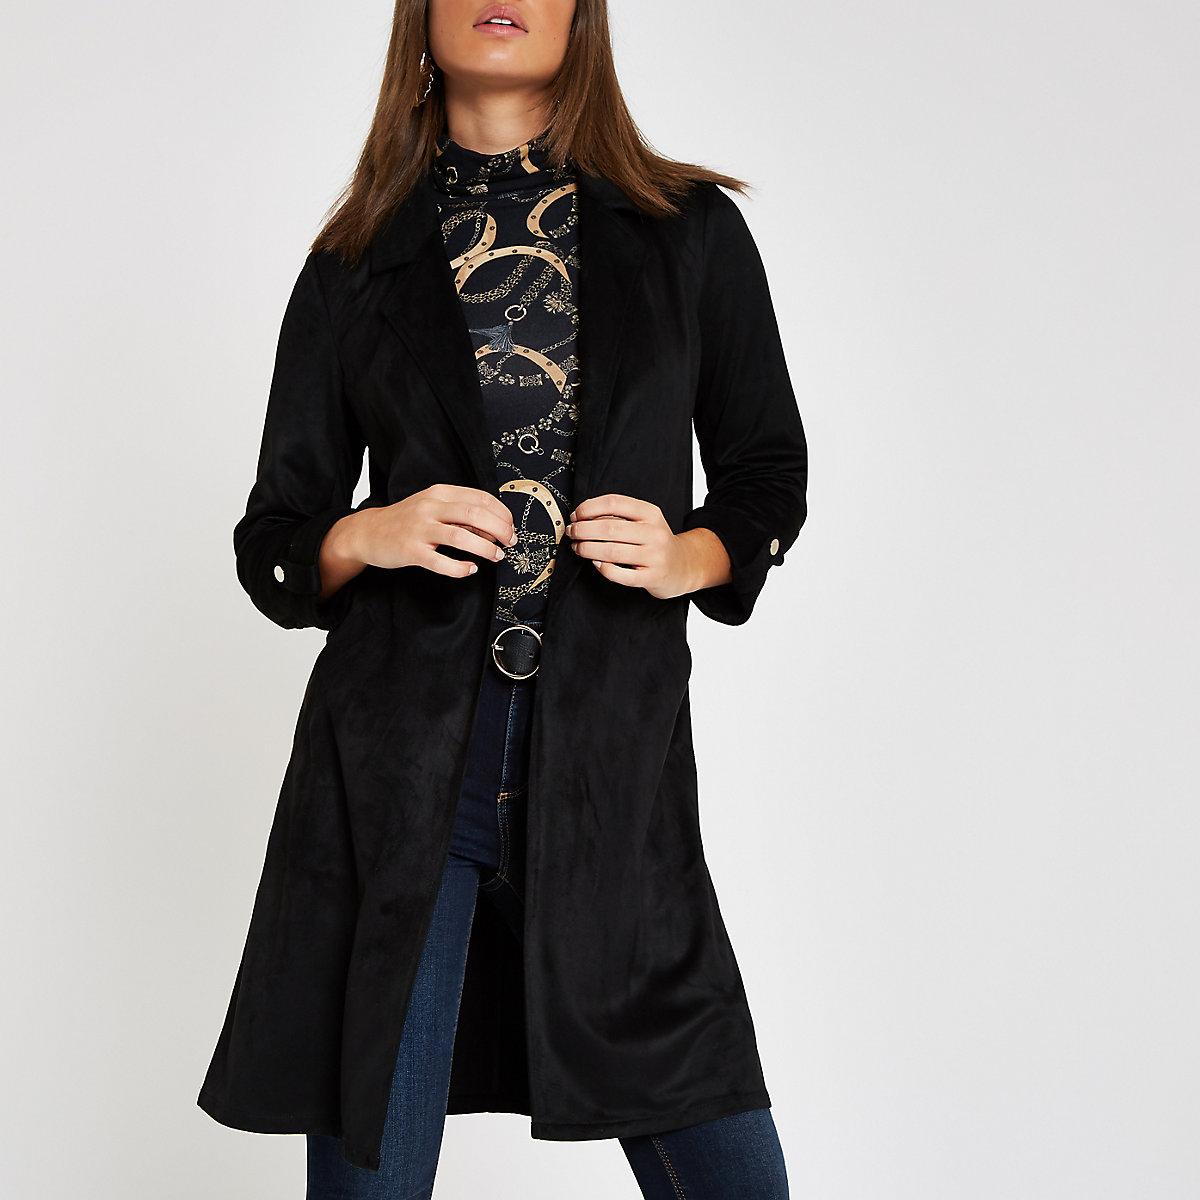 Black faux suede duster jacket